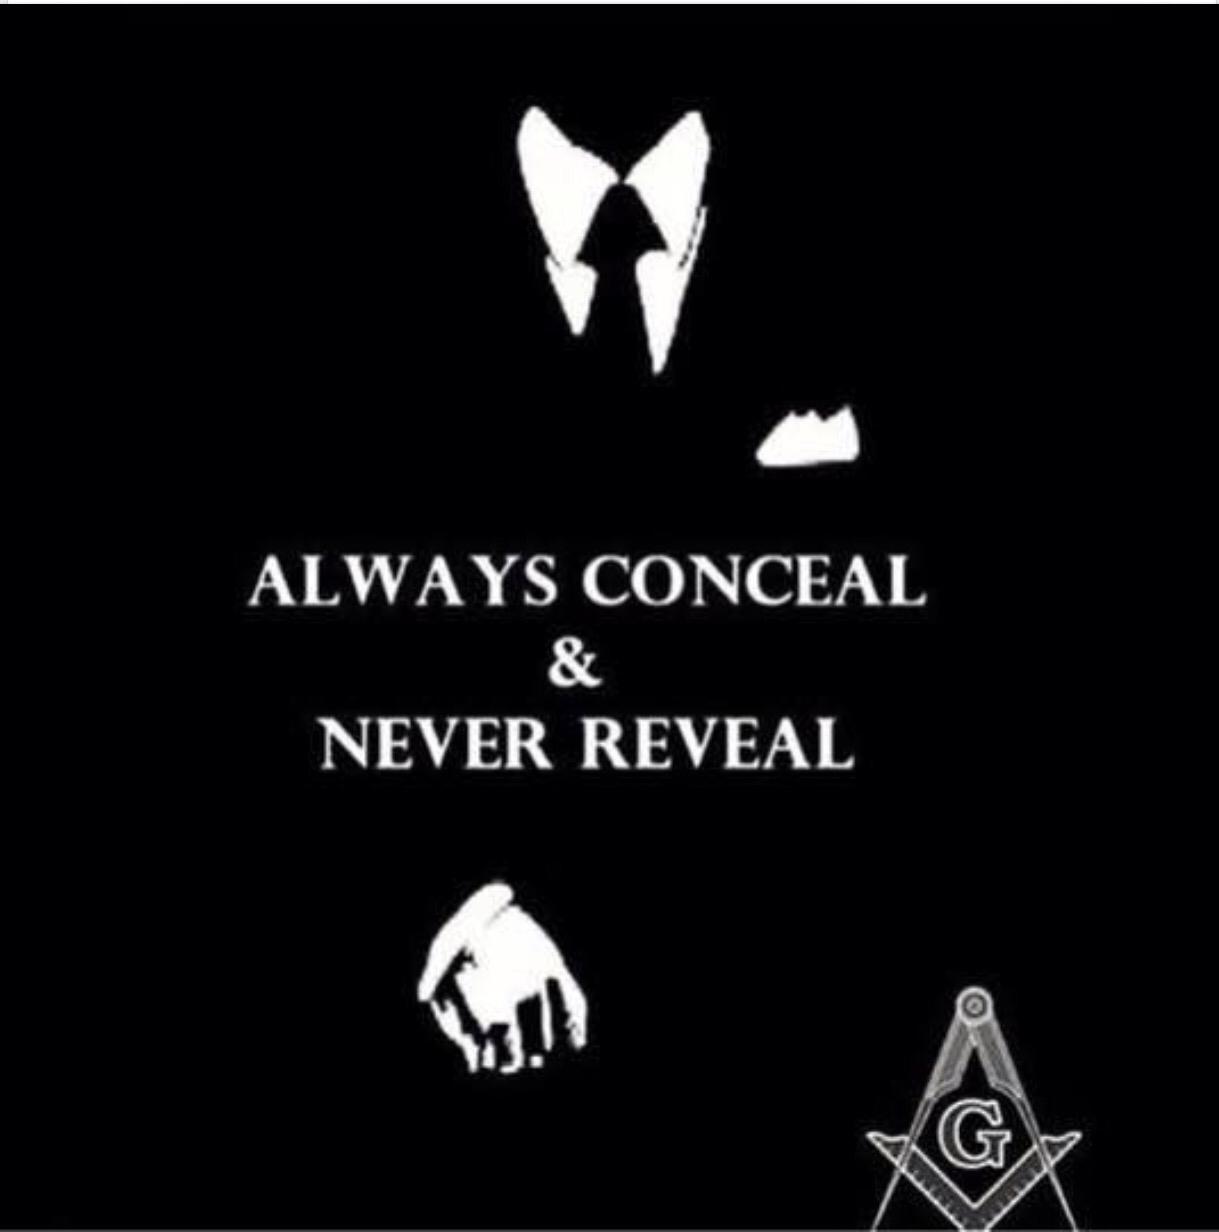 Brotherhood clipart trust Network The  of Masons